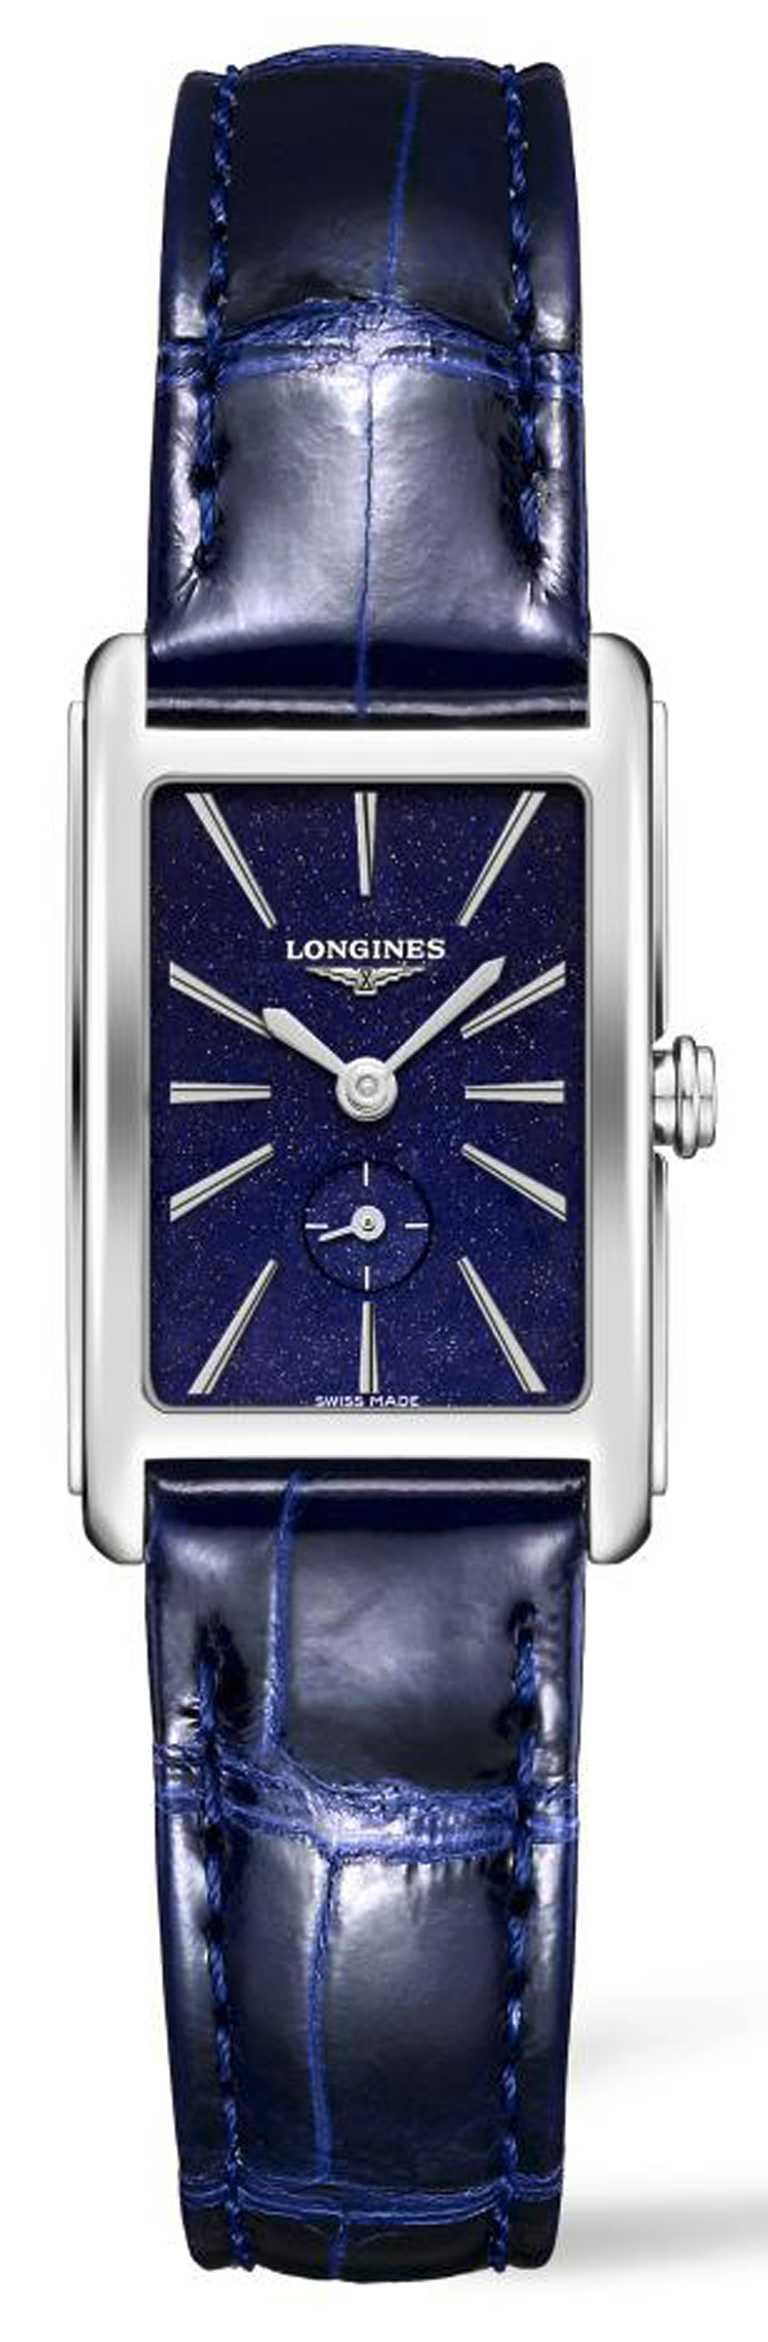 LONGINES「DolceVita多情」系列,星空藍女士腕錶,不鏽鋼錶殼,20.8 x 32mm,石英機芯,藍色皮革錶帶╱41,500元。(圖╱LONGINES提供)